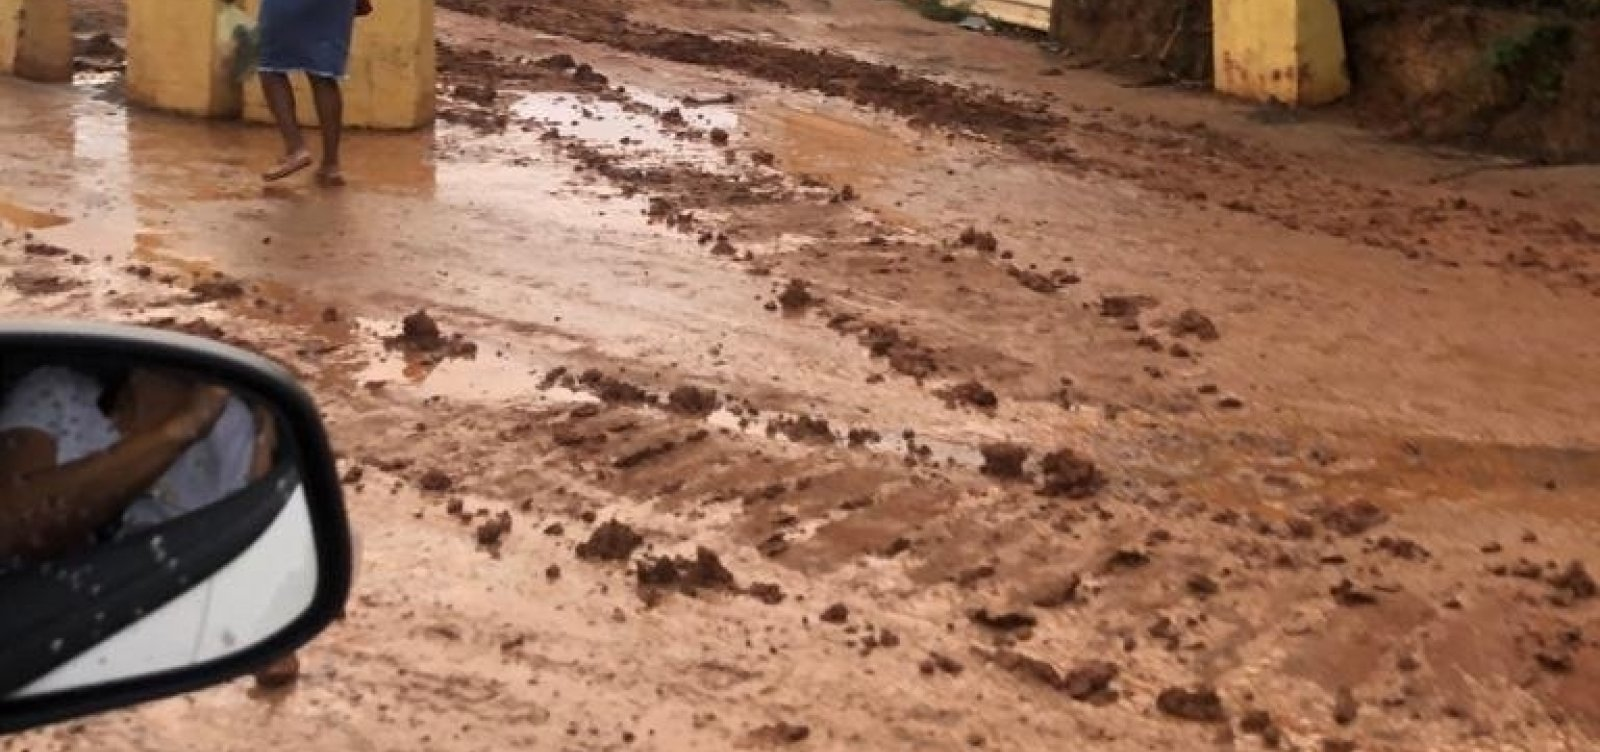 Obra da Conder em Piatã transforma pista em mar de lama